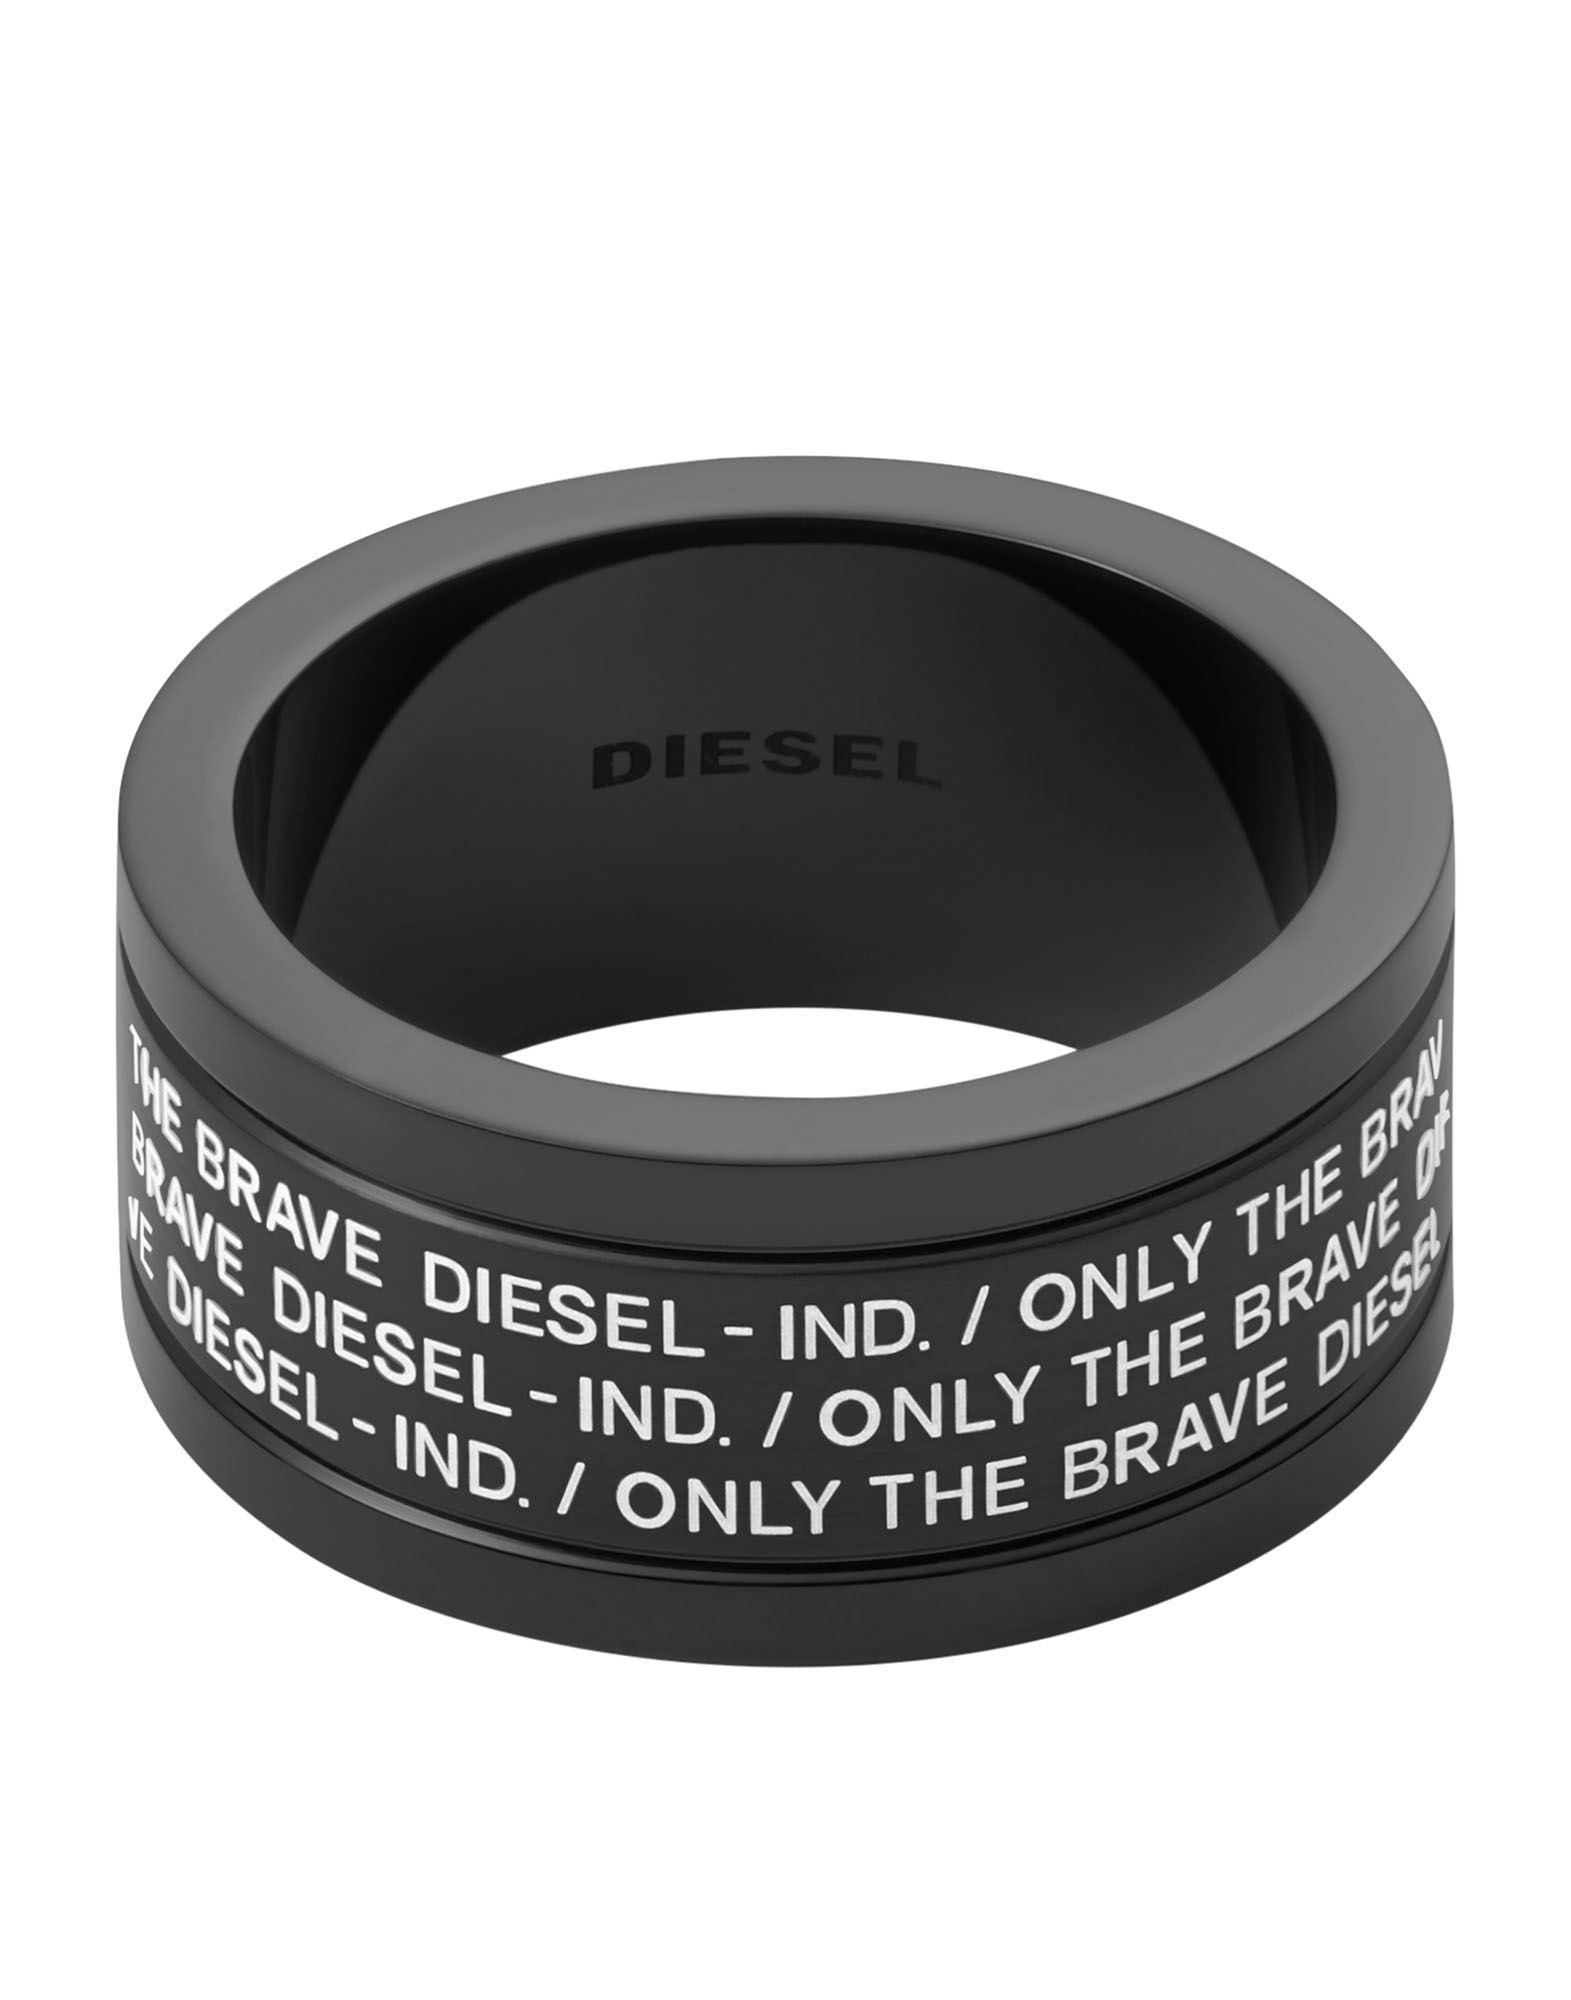 DIESEL ディーゼル メンズ 指輪 ブラック